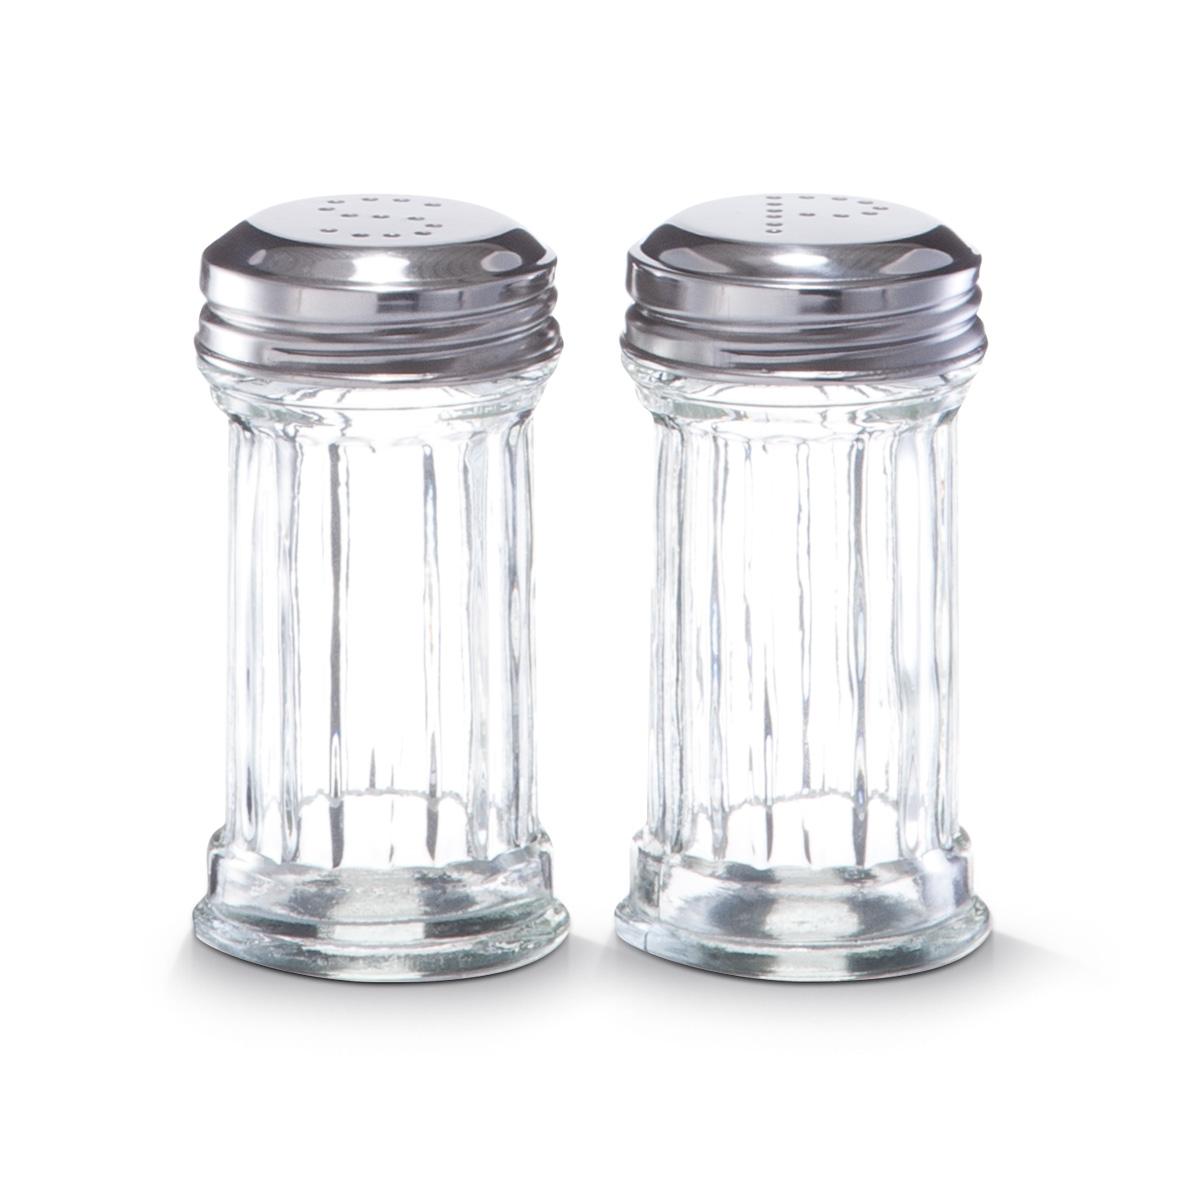 Set solnita si pipernita S&P, sticla si inox, 60 ml, Ø 5xH9,5 cm imagine